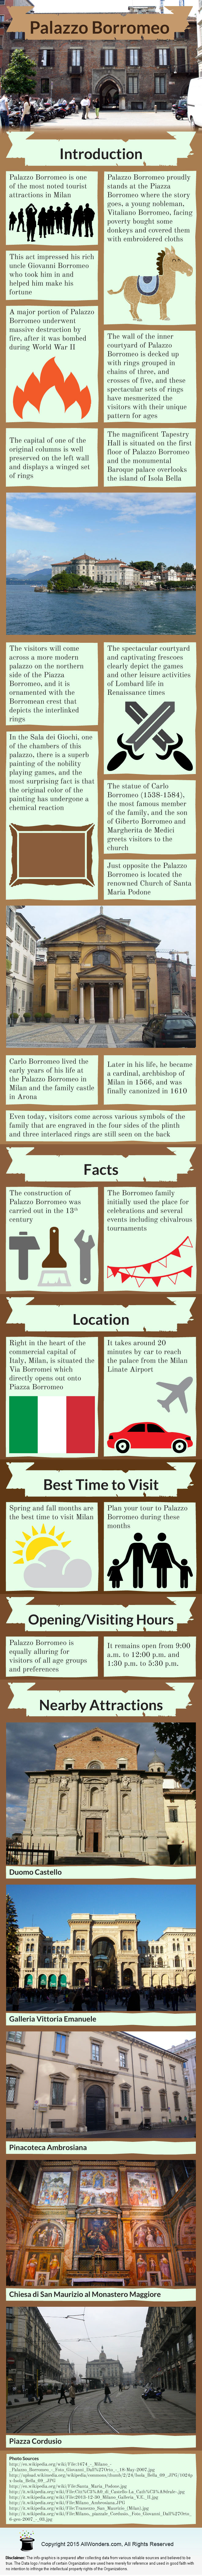 Palazzo Borromeo - Infographic